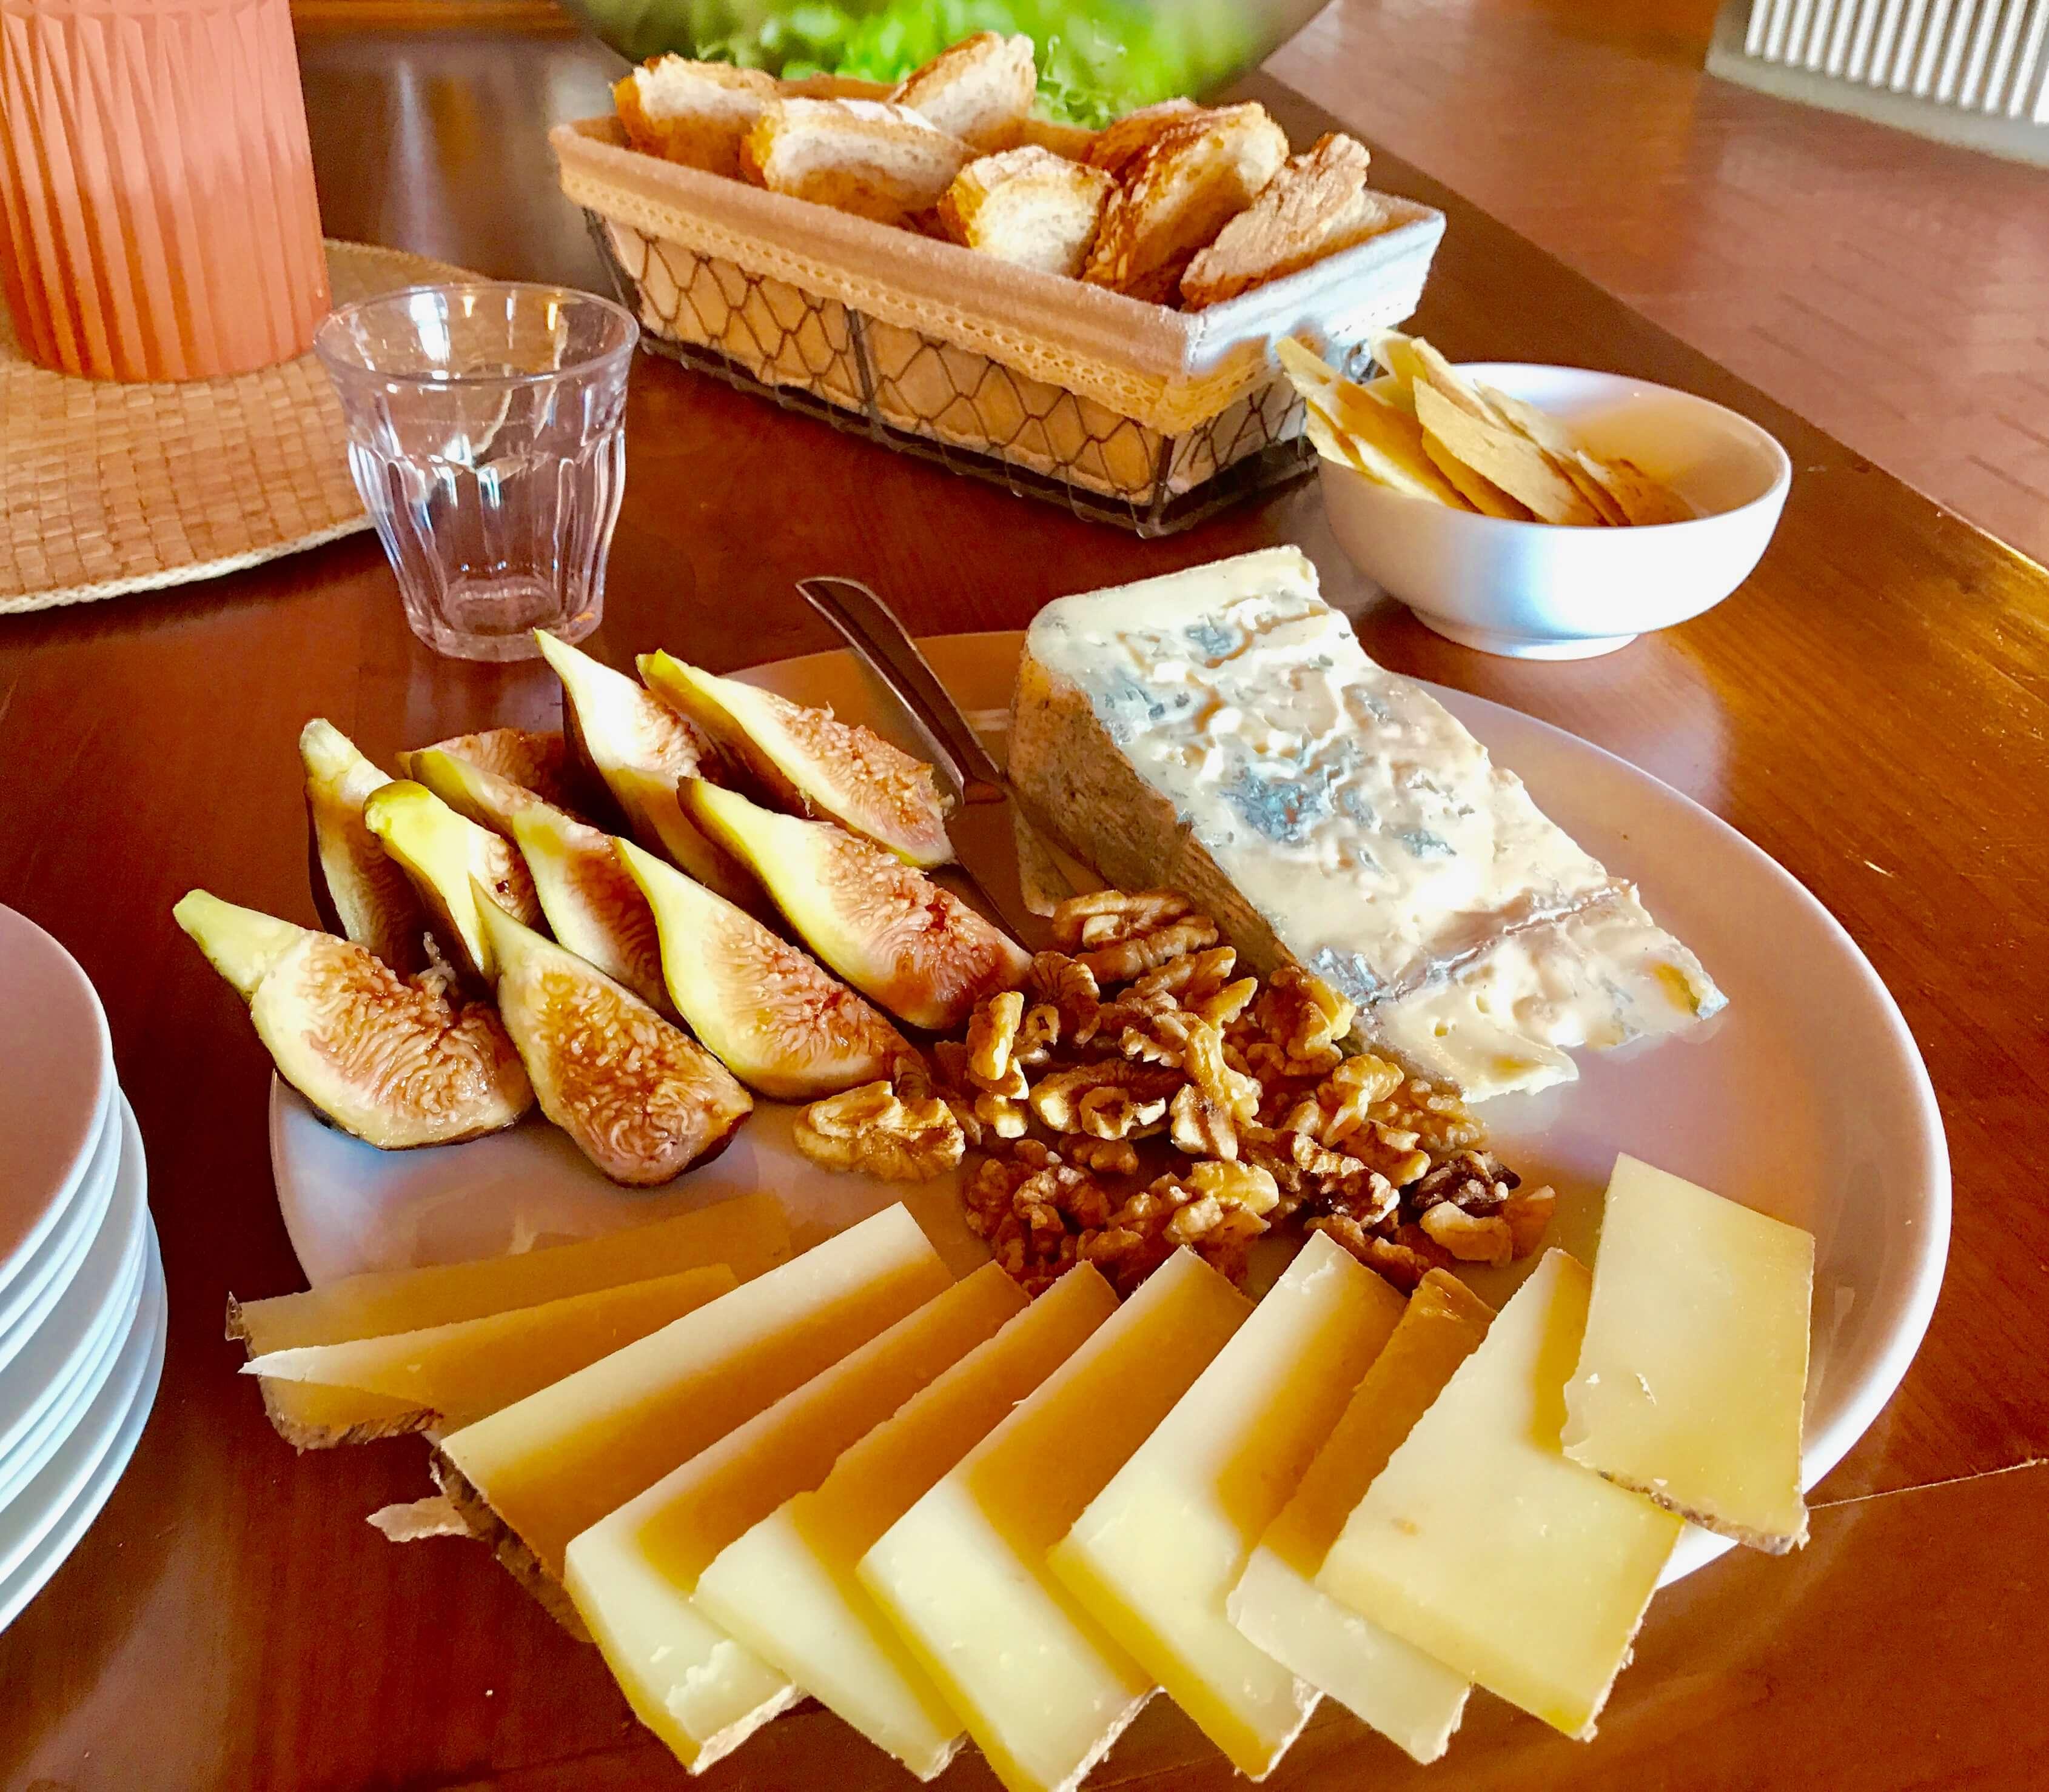 Yoga in Italy Cheese board with fresh pecorino, gorgonzola, sun-ripened figs and walnuts